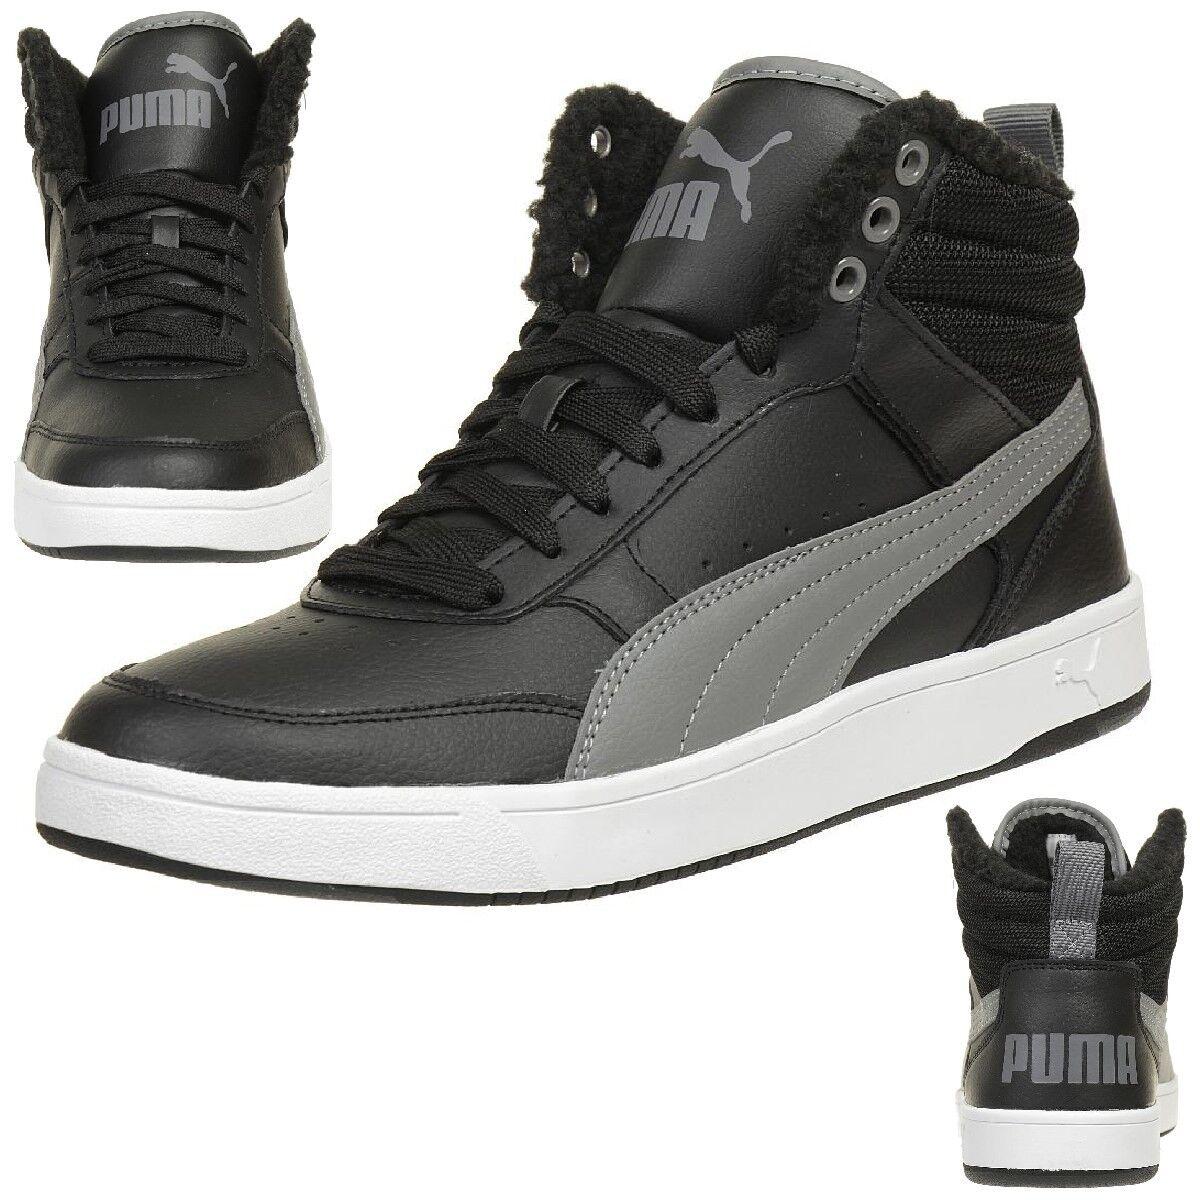 Puma Rebound Street V2 Piel botas de Invierno Hombres negro Forrado Cálido